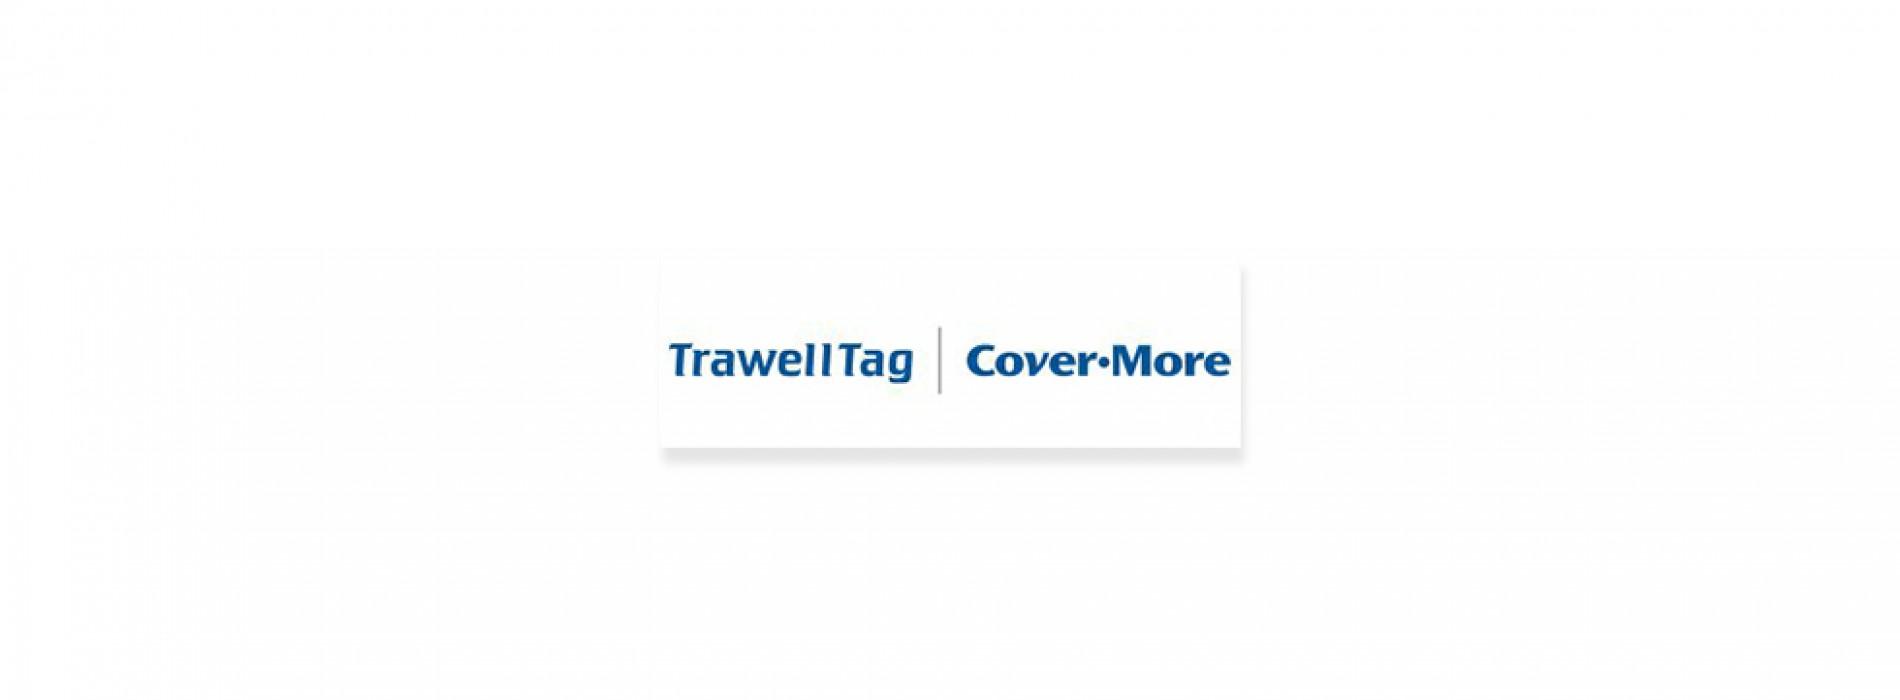 TrawellTag Cover-More announces its association with Yatra.com